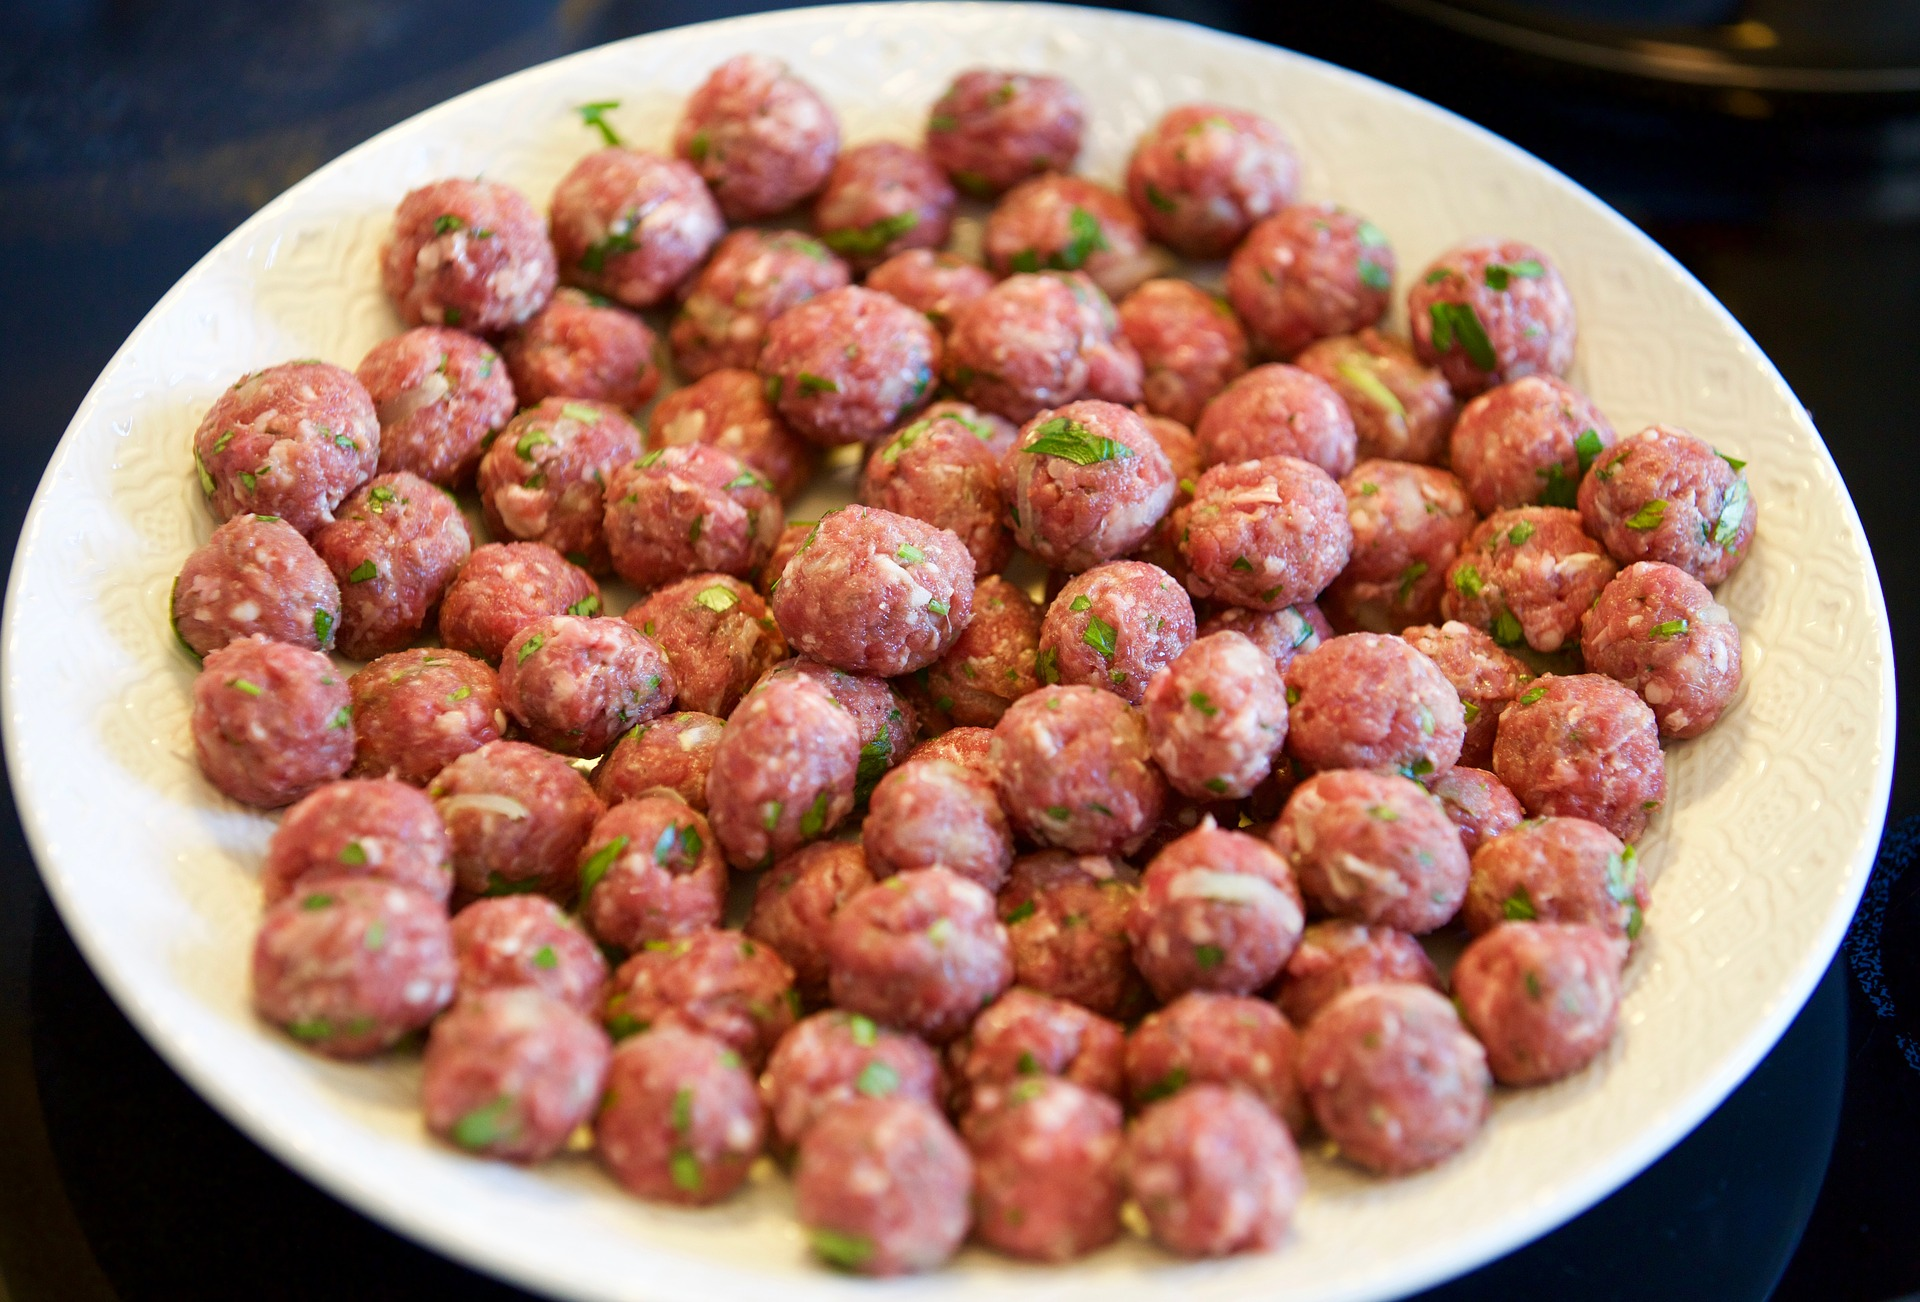 meatball-2456234_1920